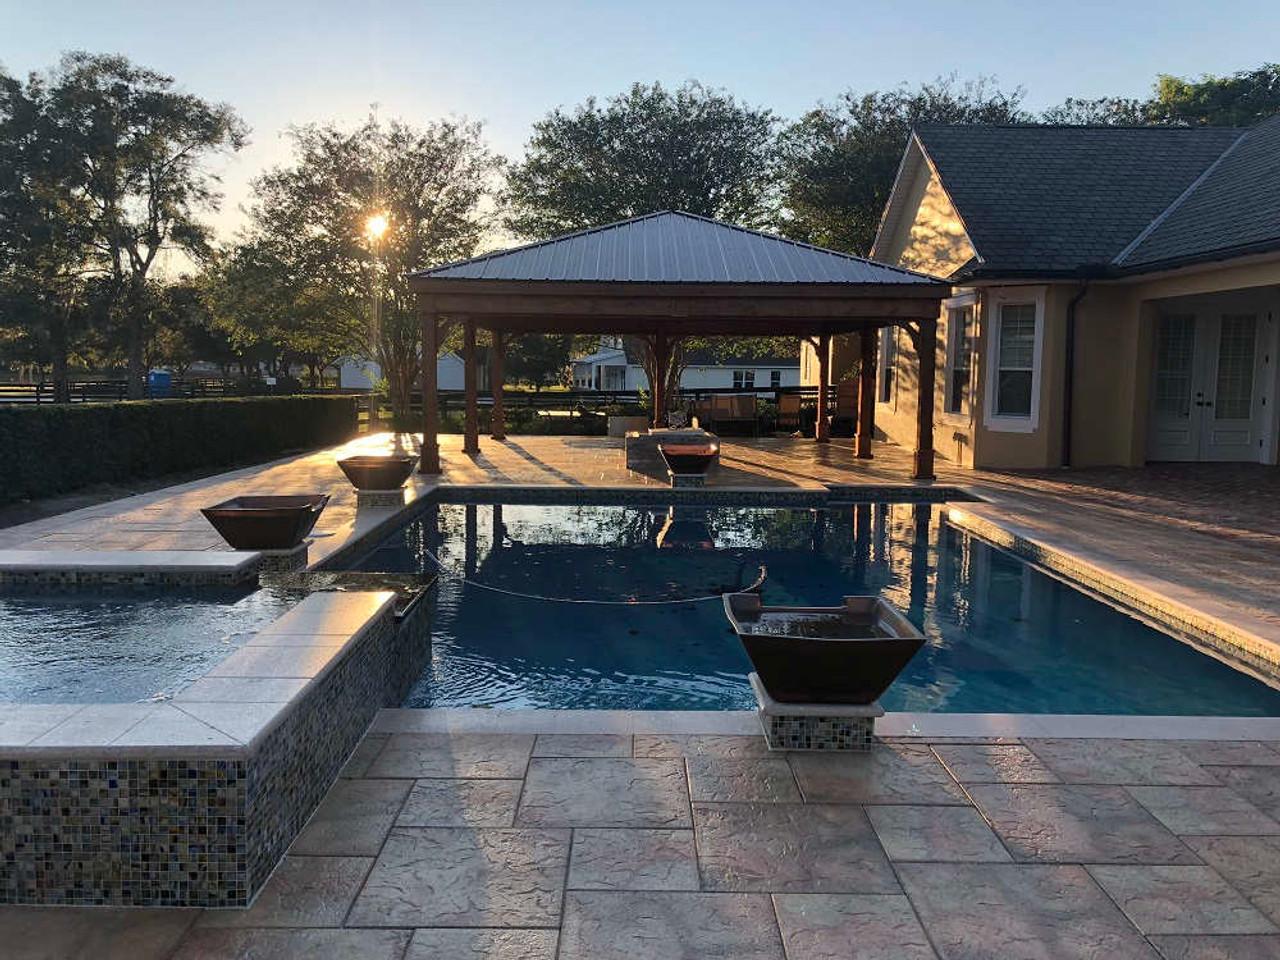 24x26 Red Cedar Trad'l Roof Pavilion Kit for pool area, The Villages, FL